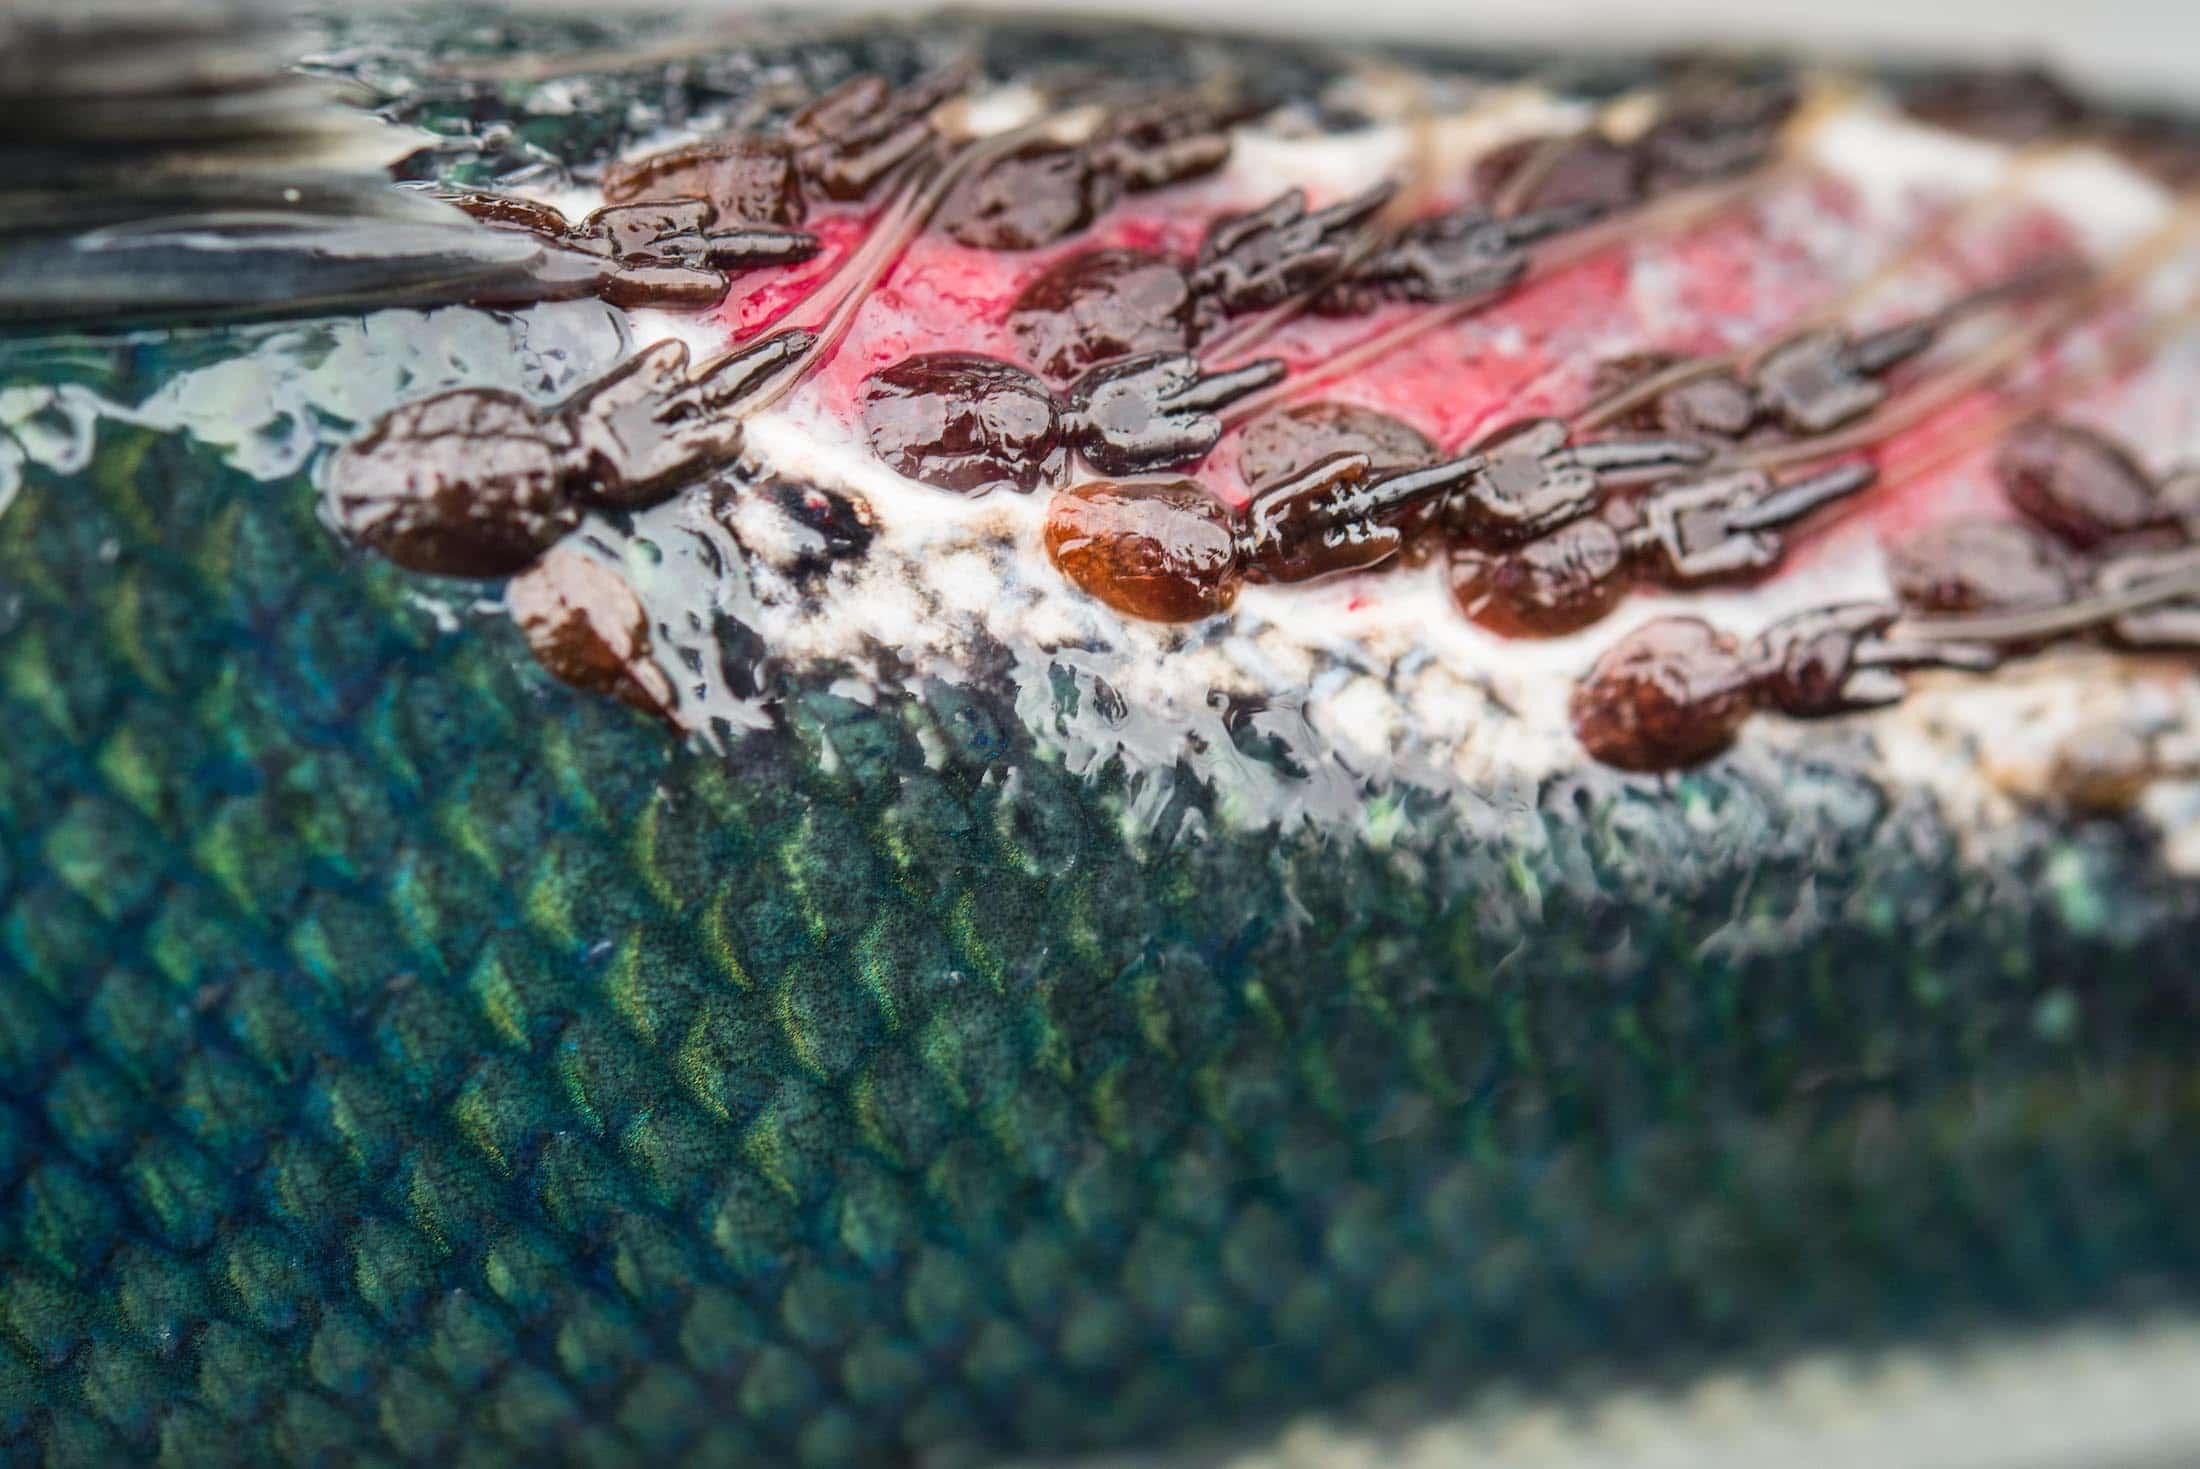 Fraser River sockeye salmon sea lice Tavish Campbell